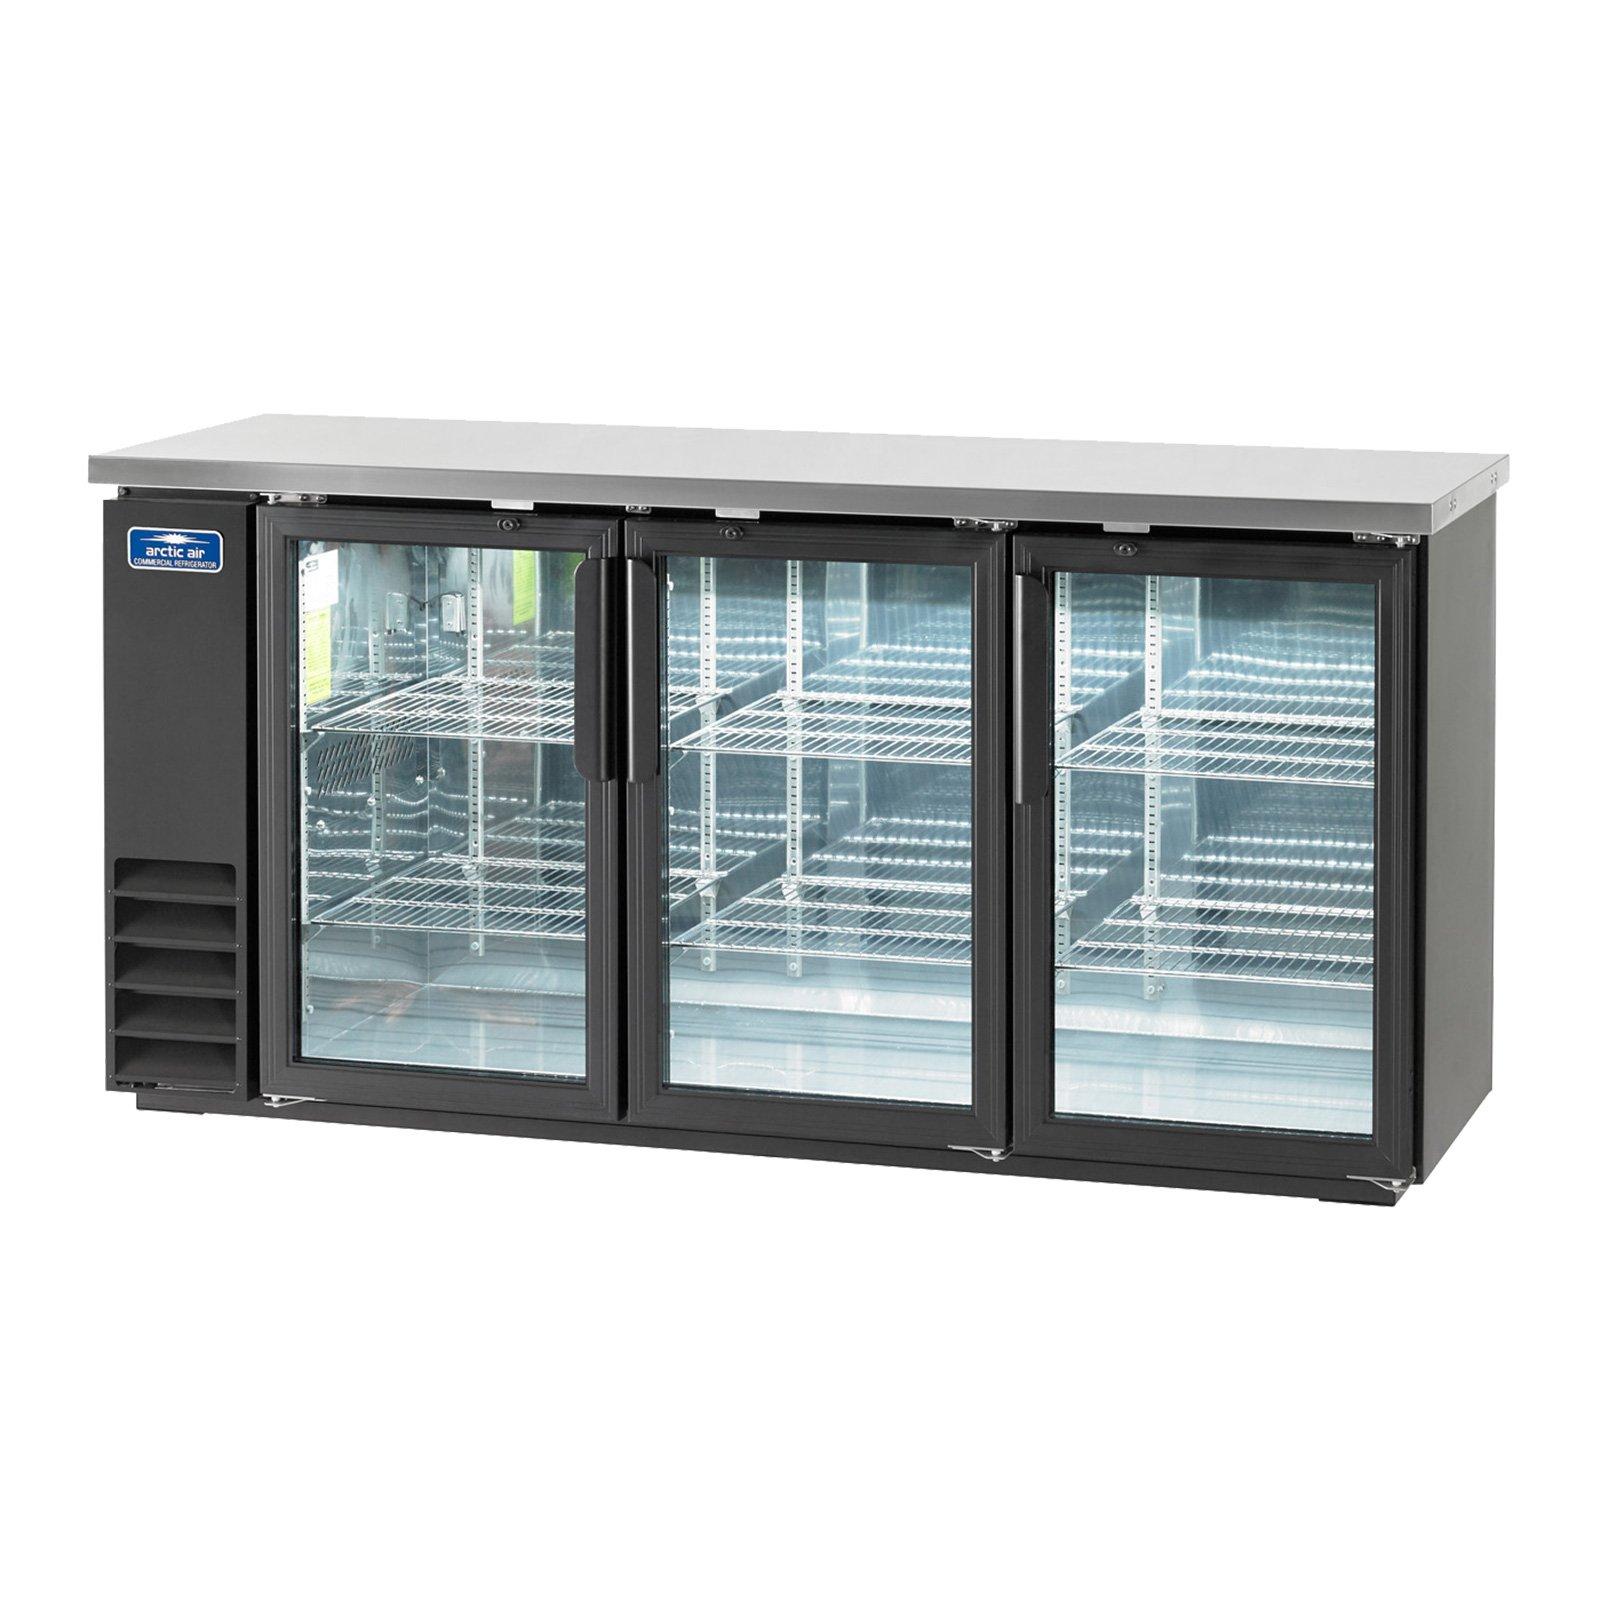 Arctic Air ABB72G Glass 73-Inch 3-Door Back Bar Refrigerator, 115v by Arctic Air